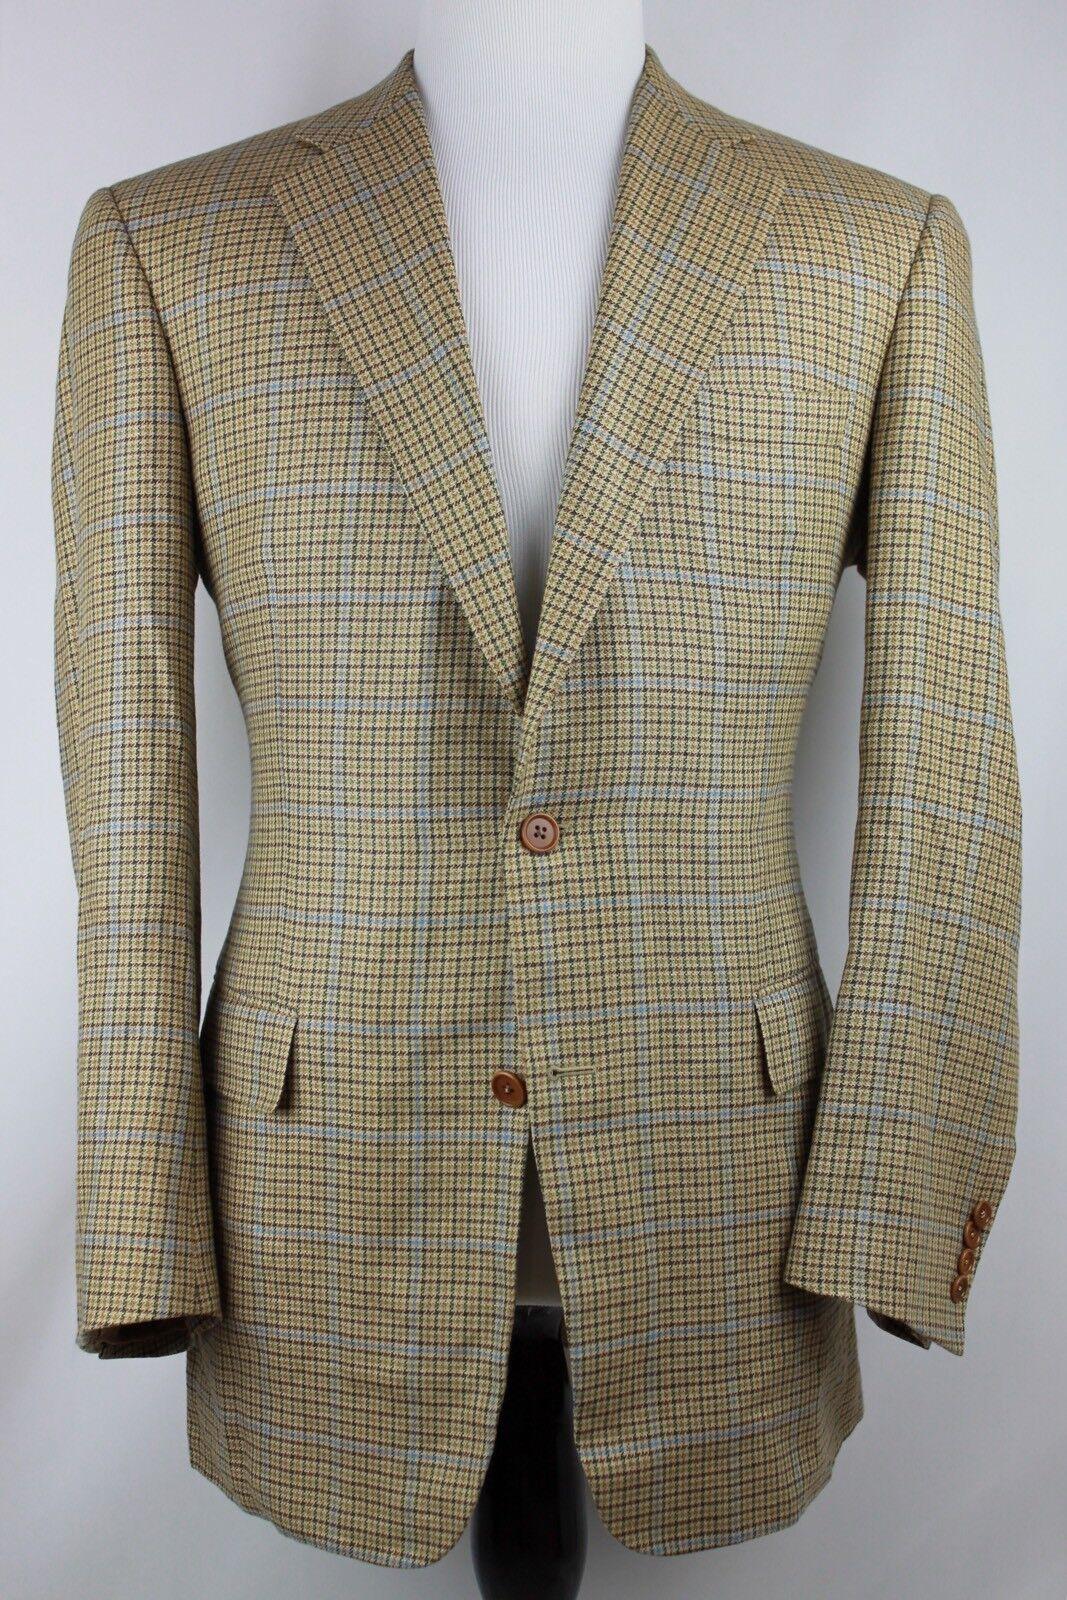 Brooks Bredhers 1818 Madison Baby bluee gold Linen Wool Glen Plaid Tweed SC 41r